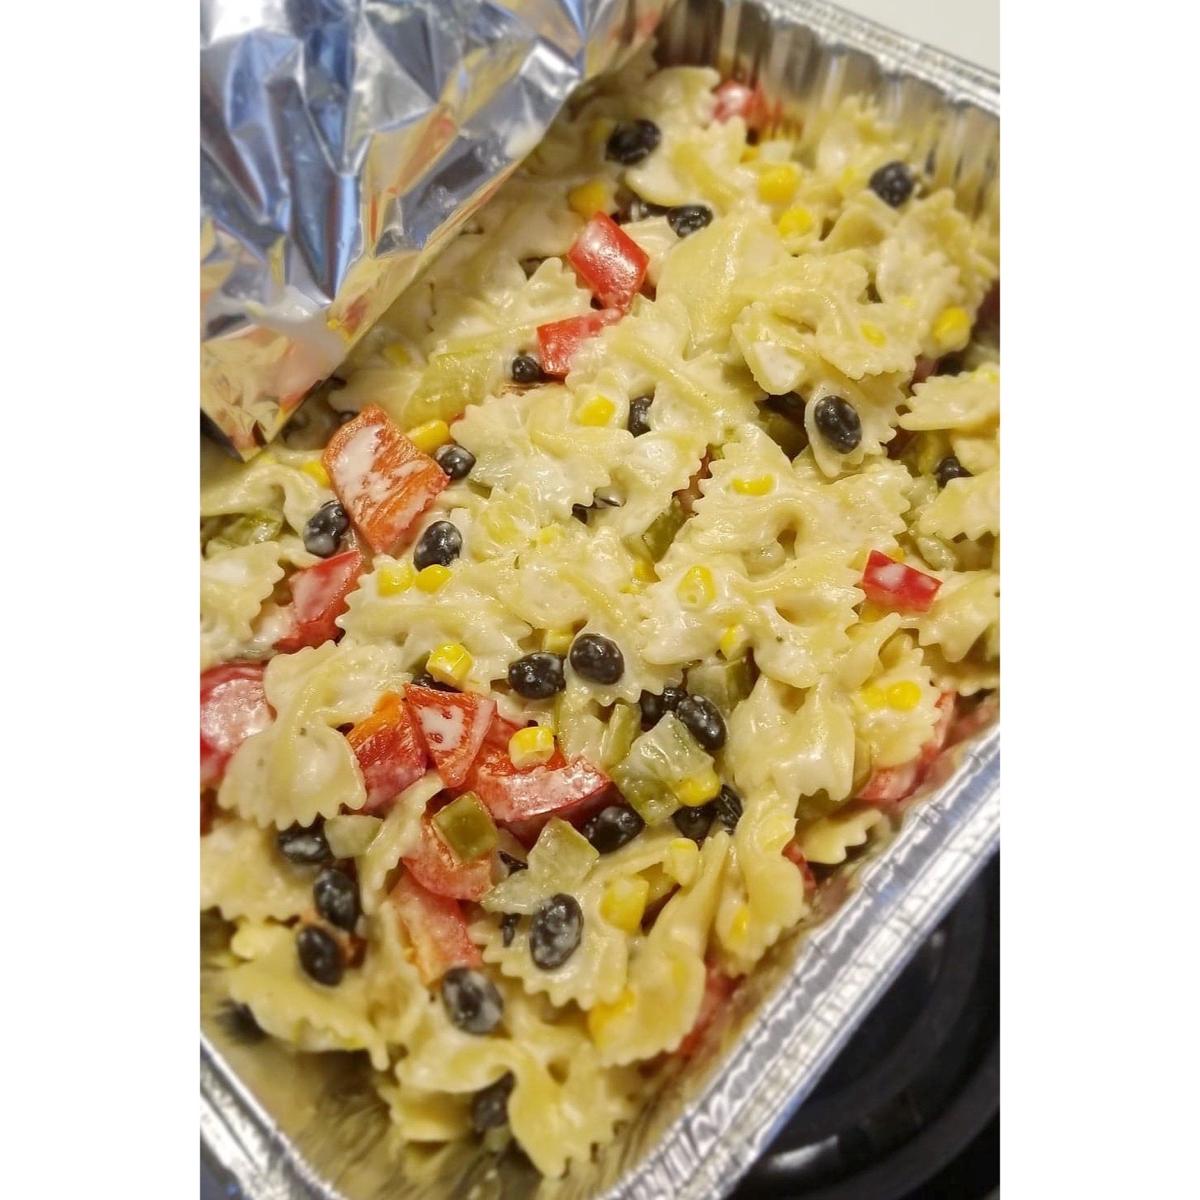 pickle-pasta-salad-vegan-1-qt-